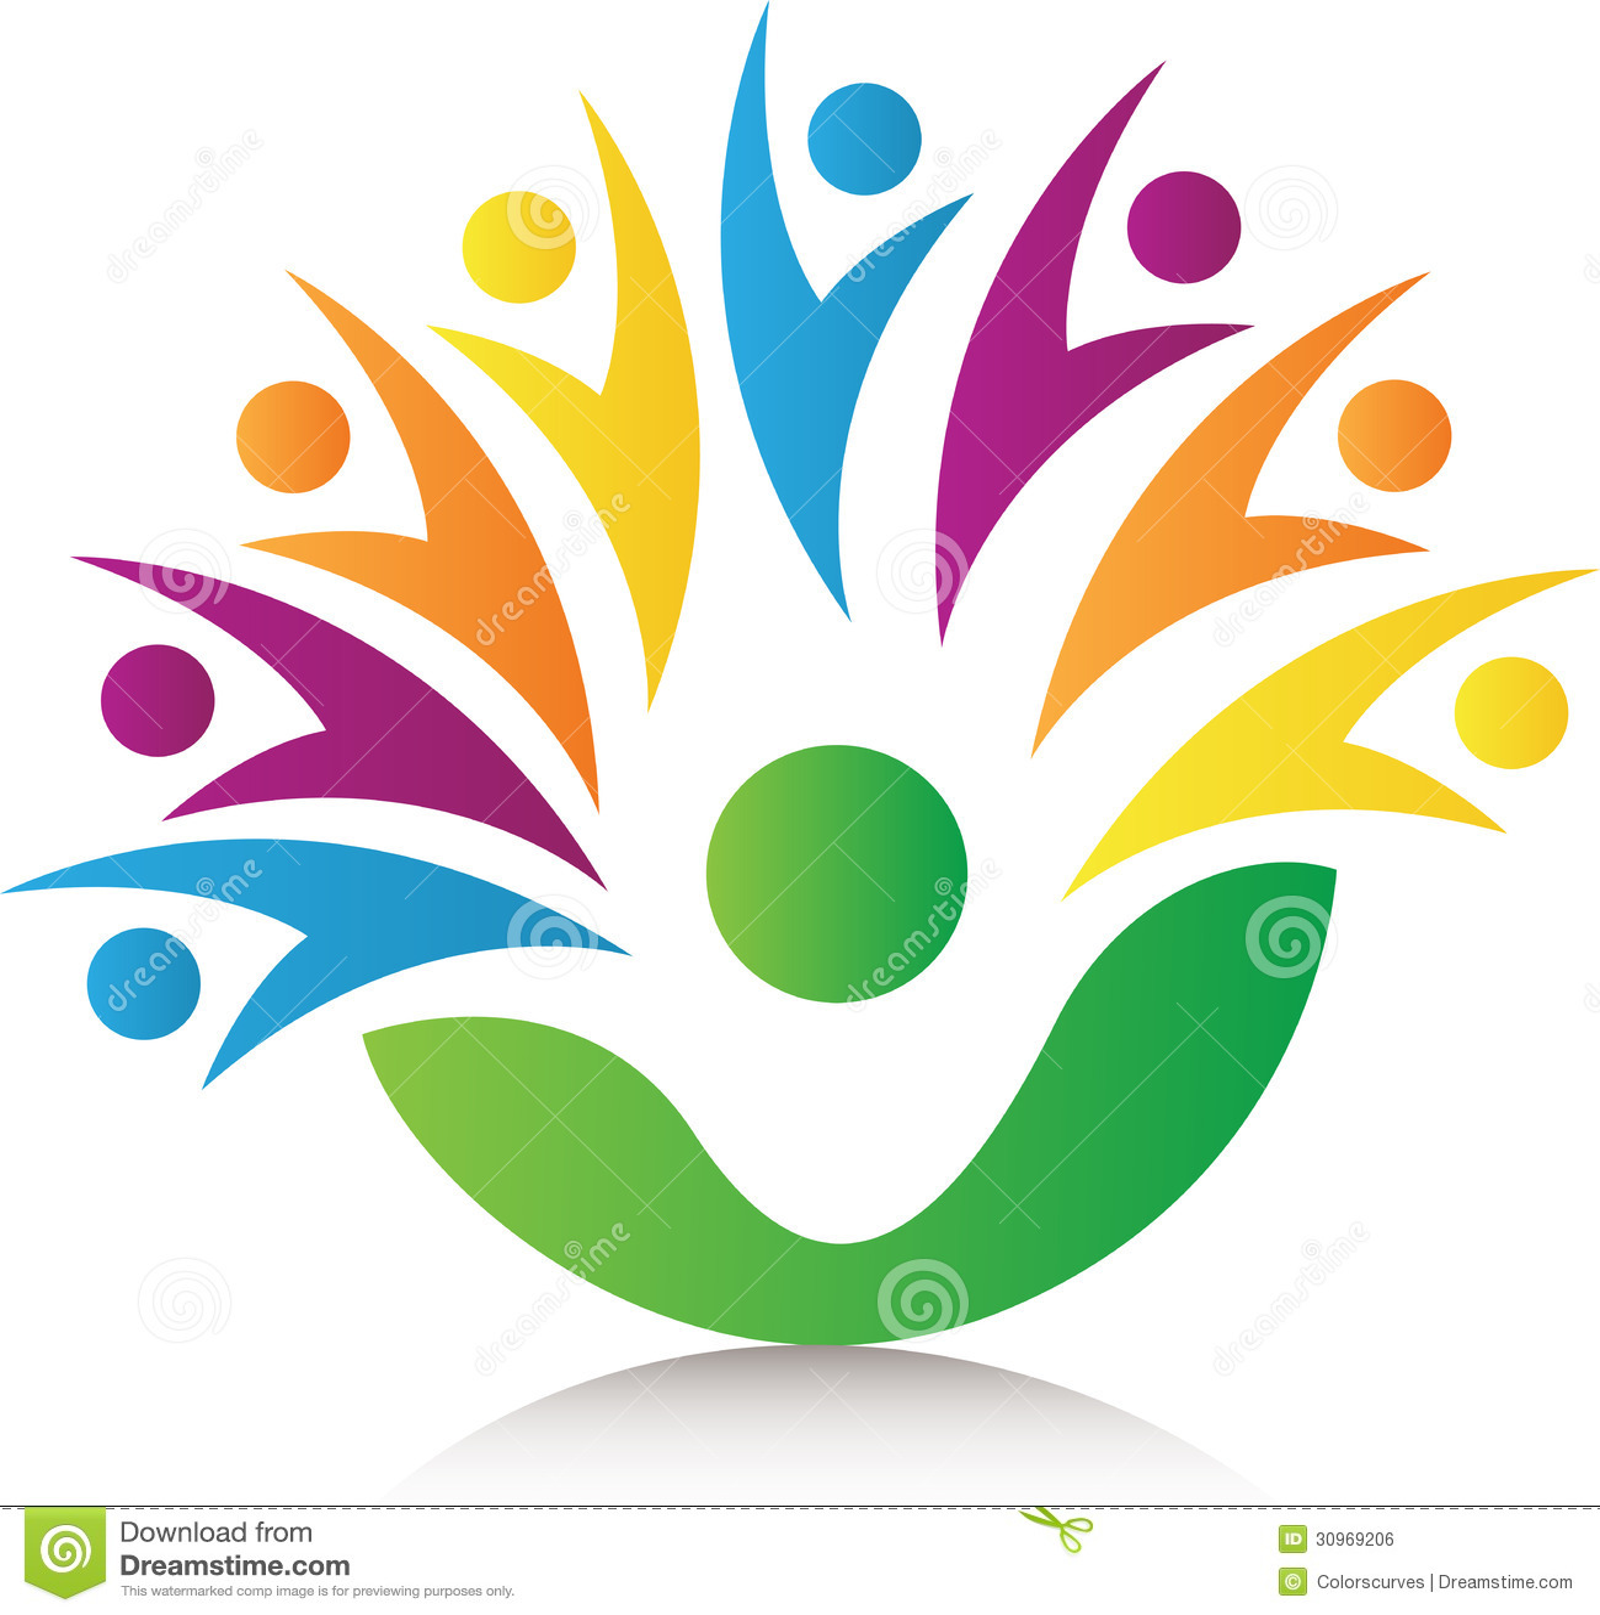 People together logo stock vector. Illustration of design ...